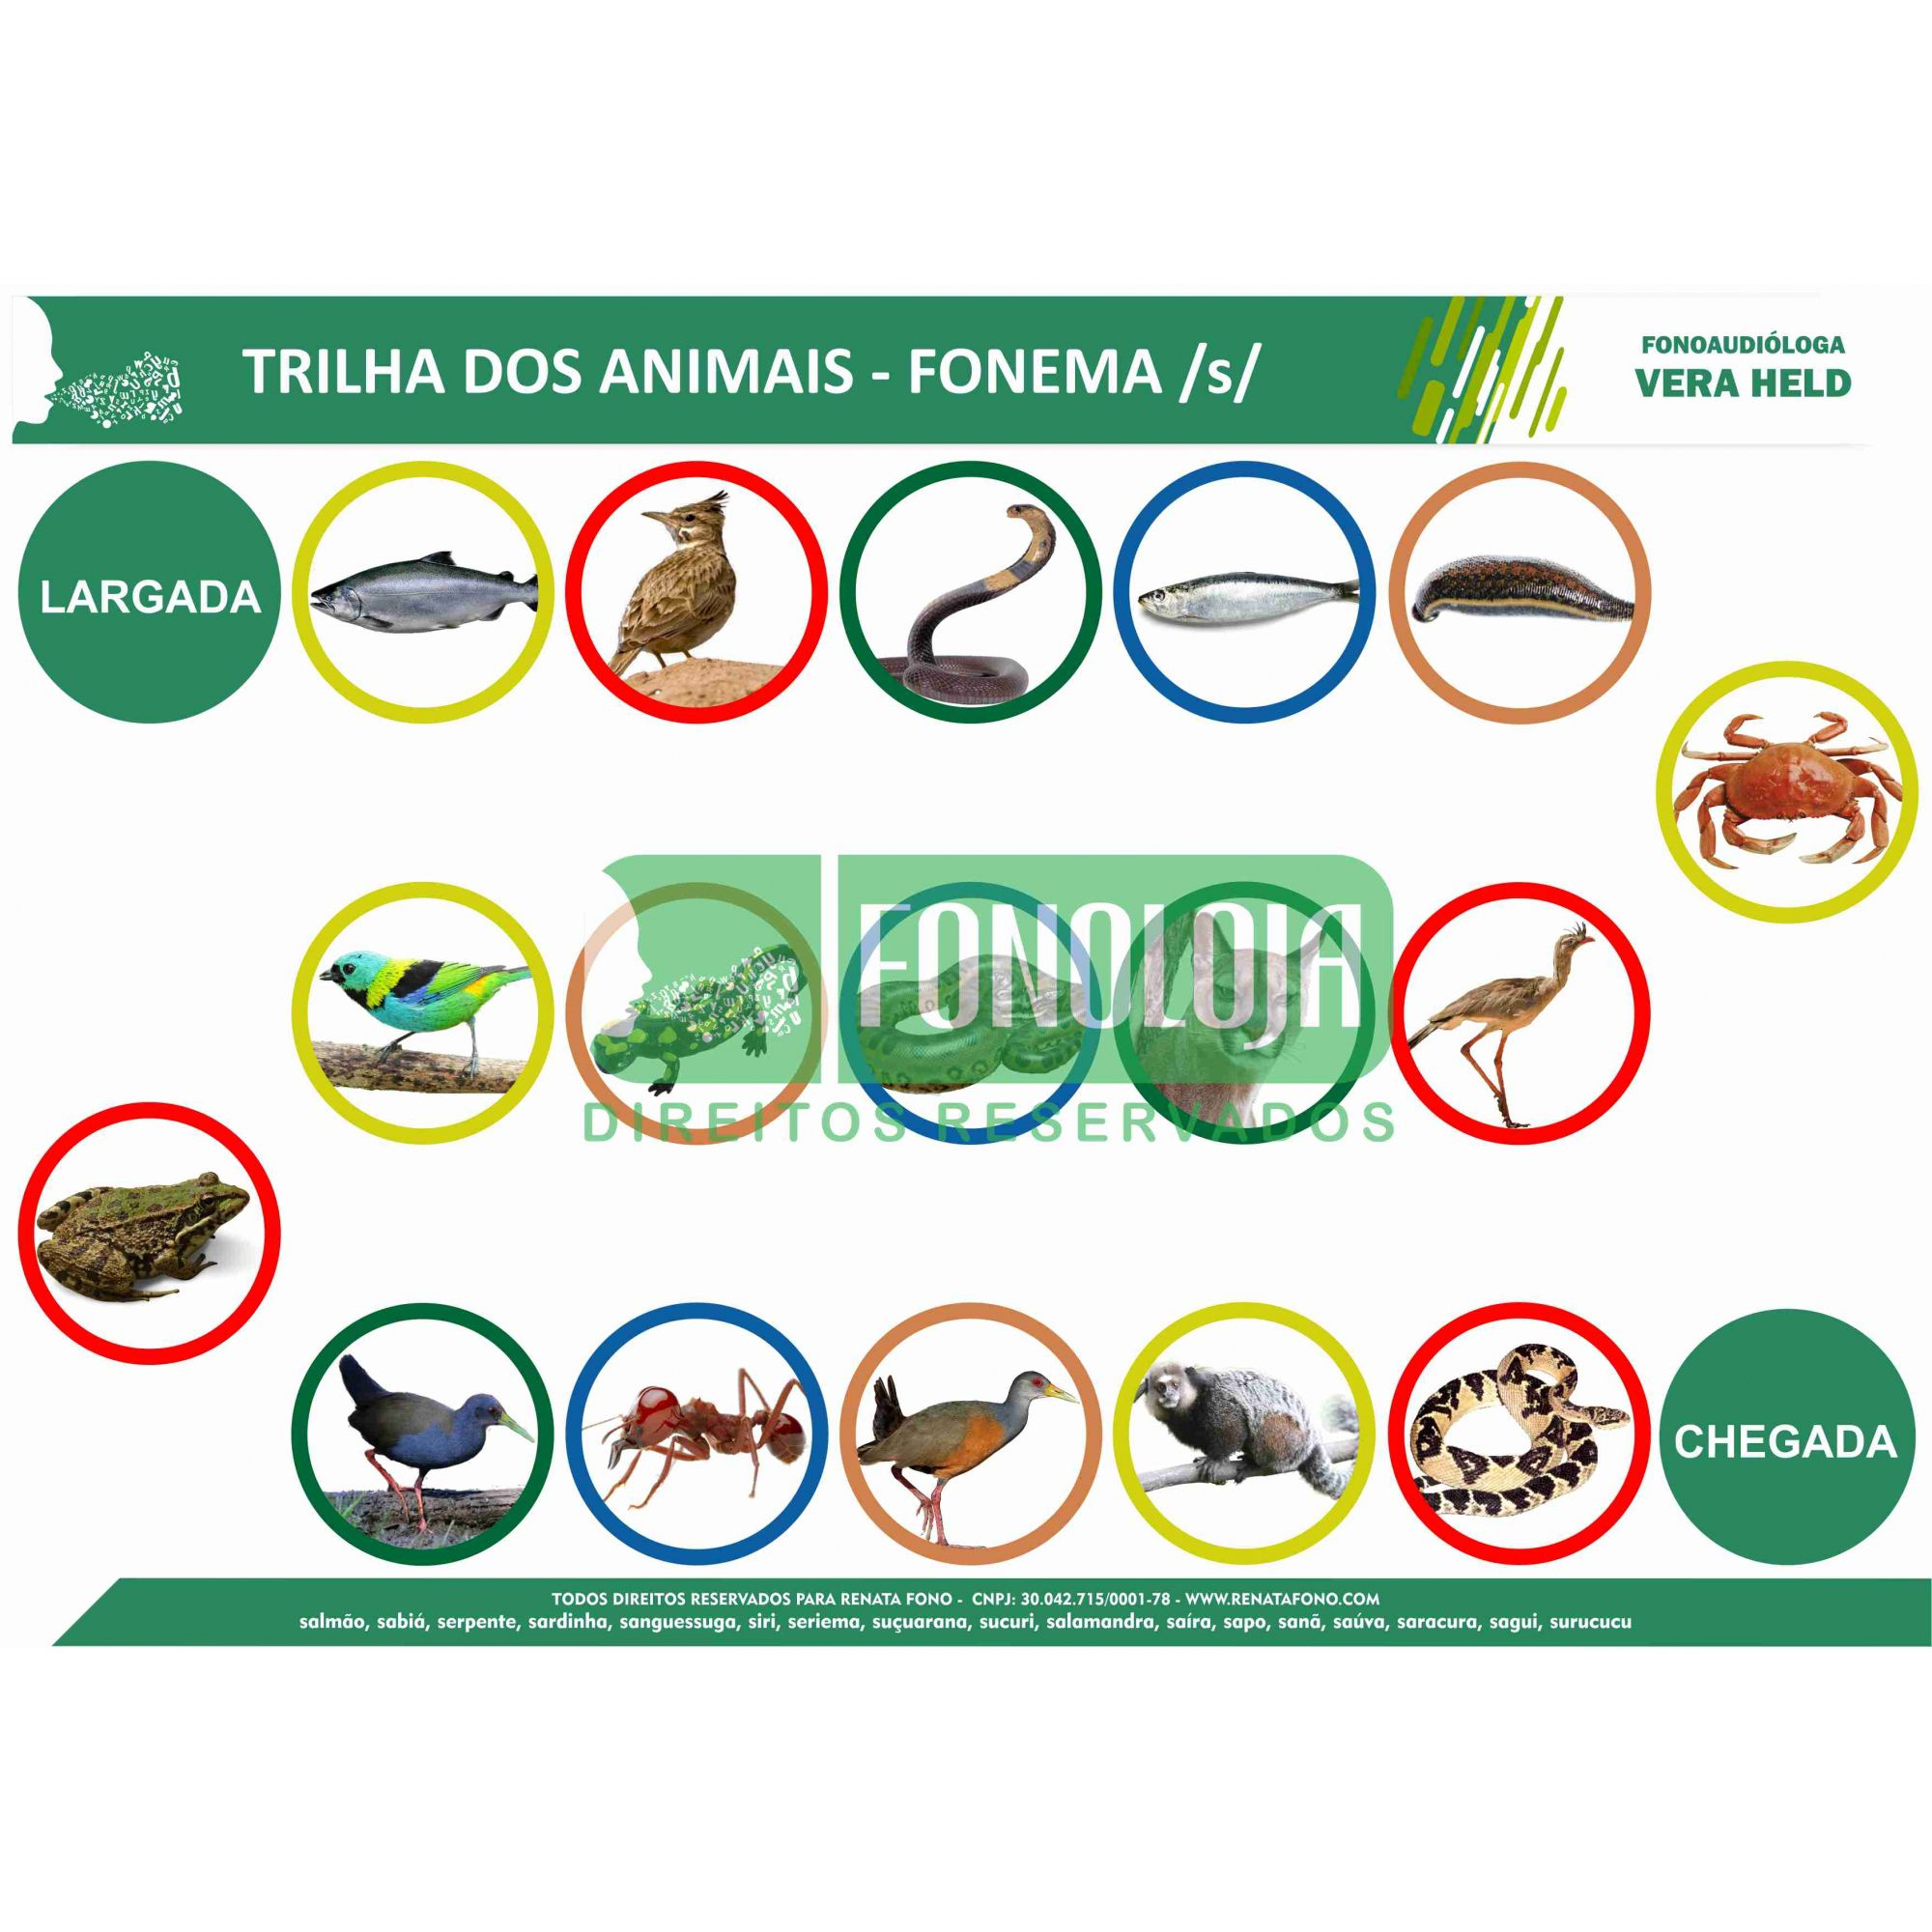 KIT 22 - 06 PRANCHAS JOGOS DE TRILHA FONEMAS FRICATIVOS